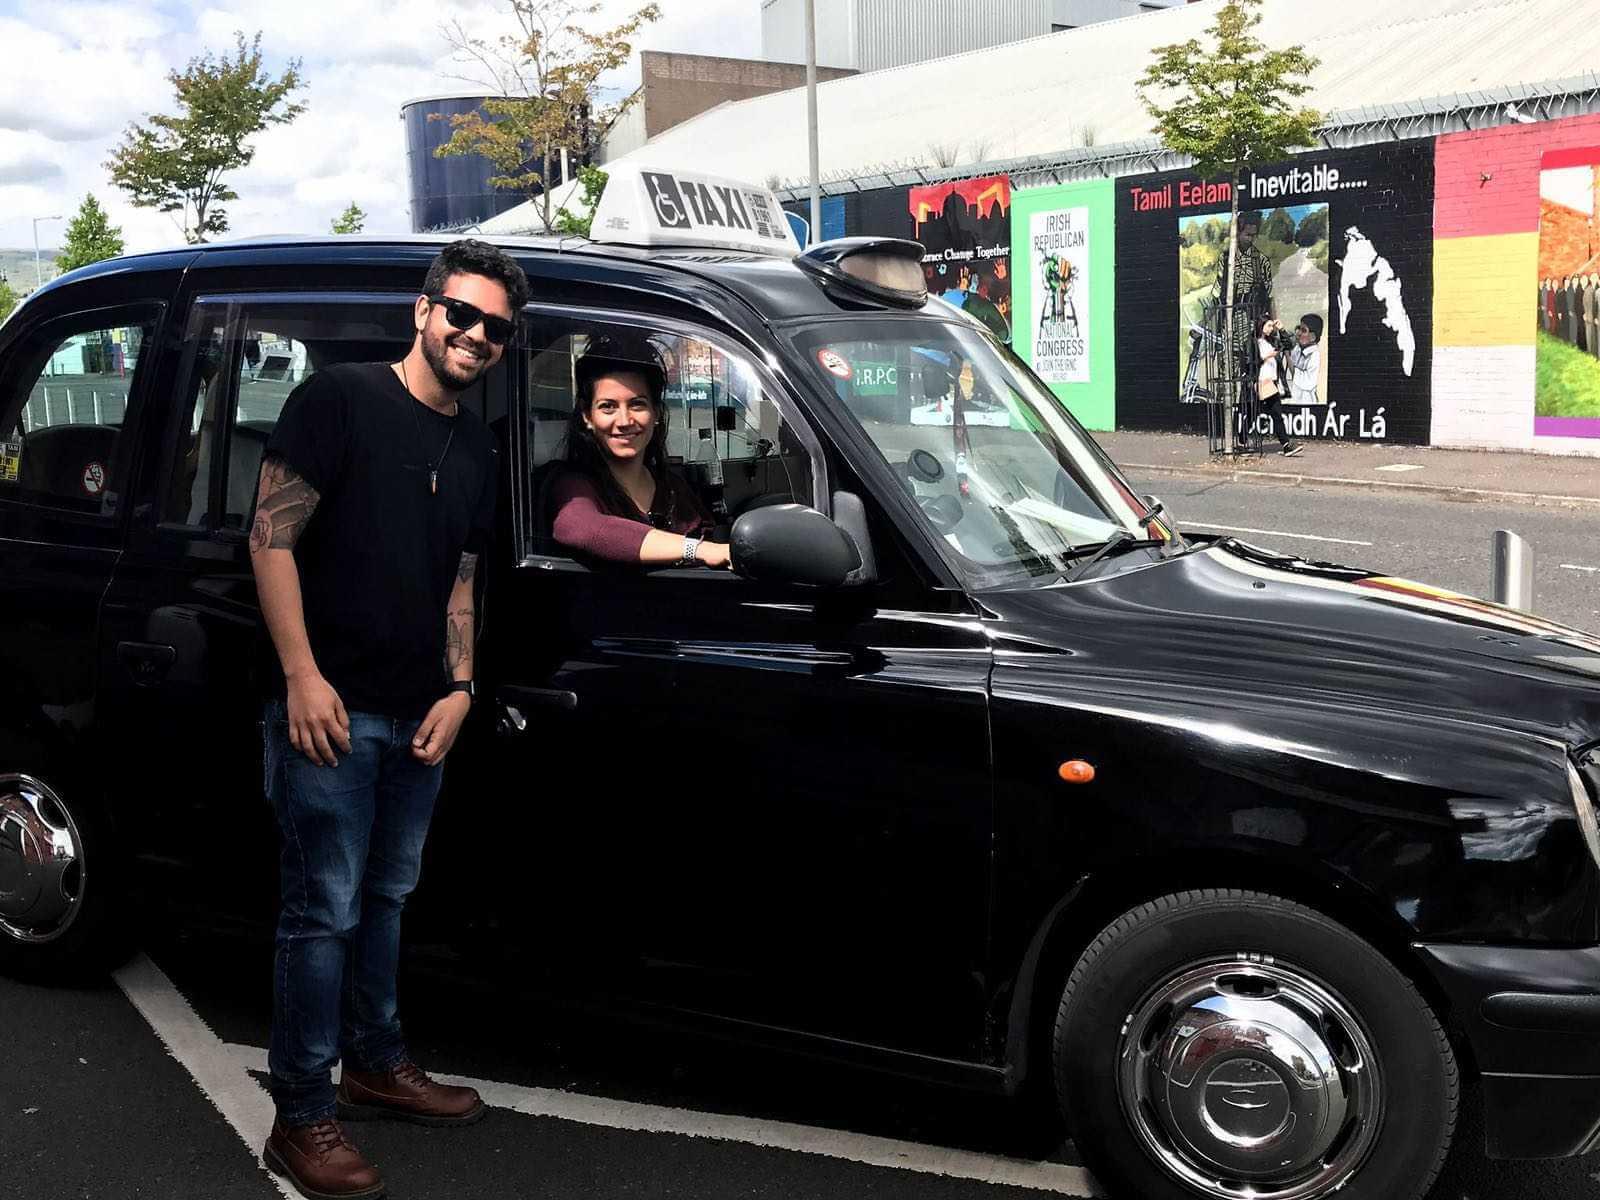 Black-Cab-Tour